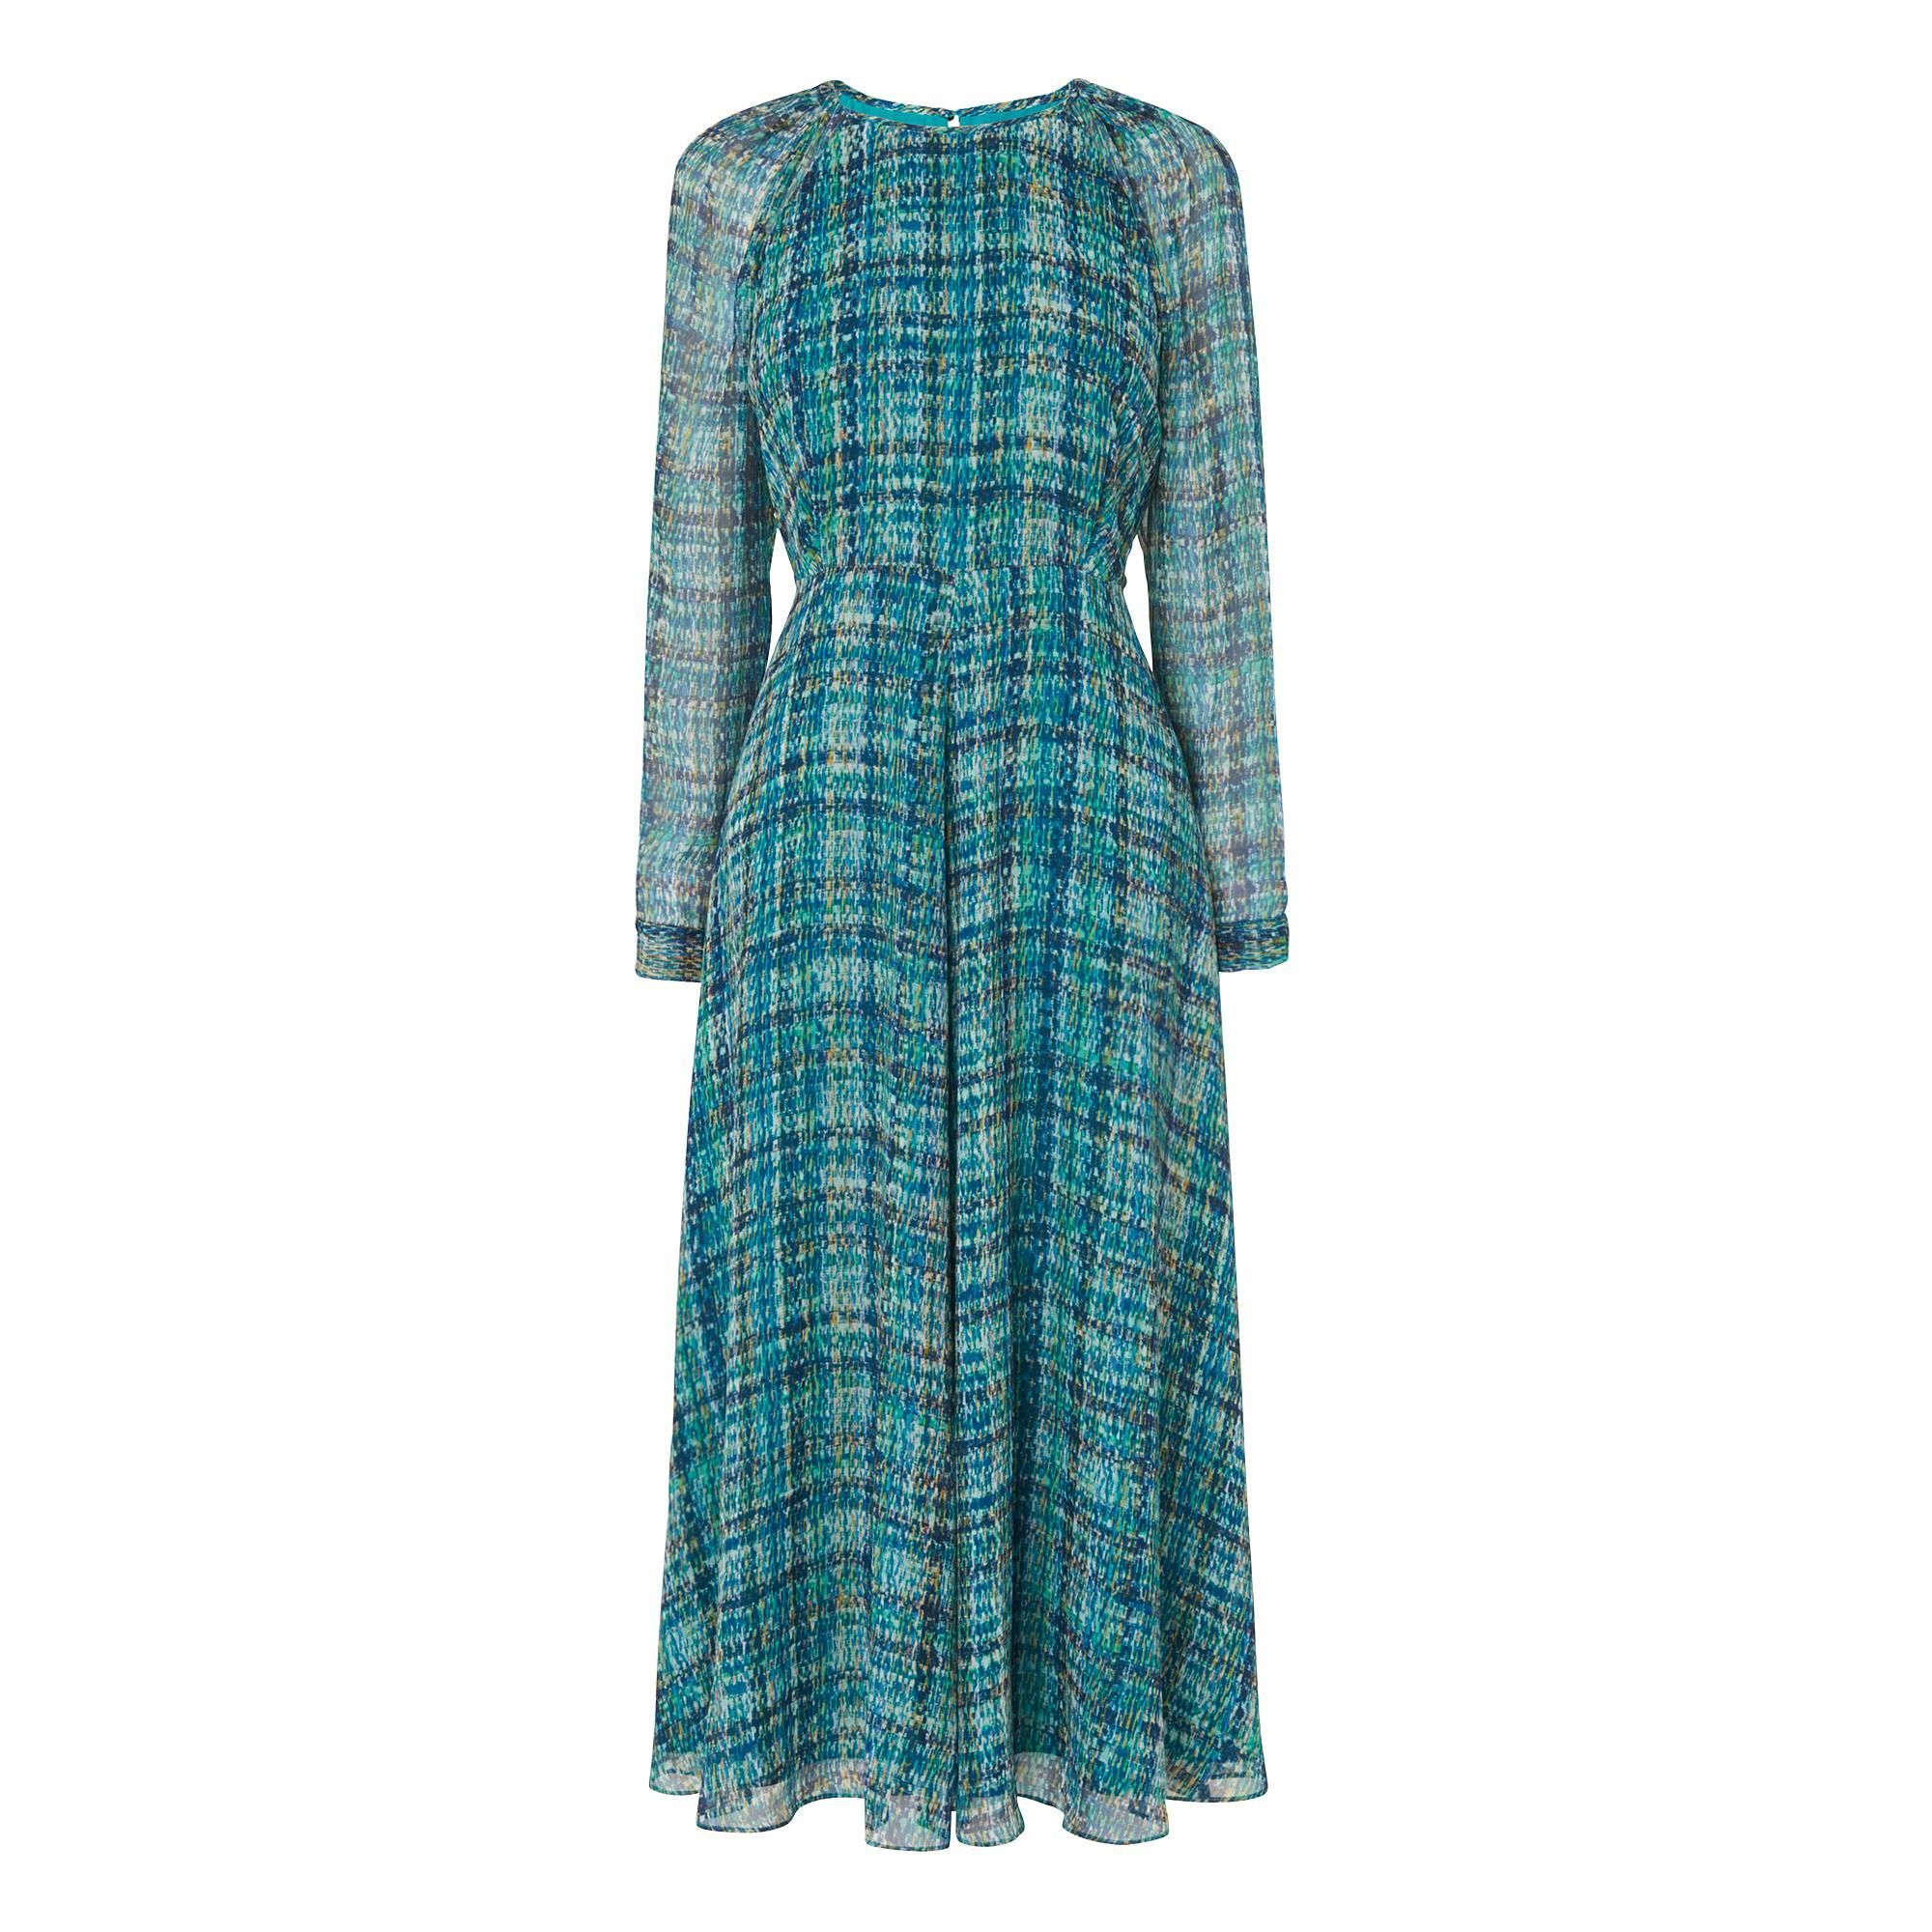 Magda Silk Dress | Dresses | Clothing | Collections | L.K.Bennett, London